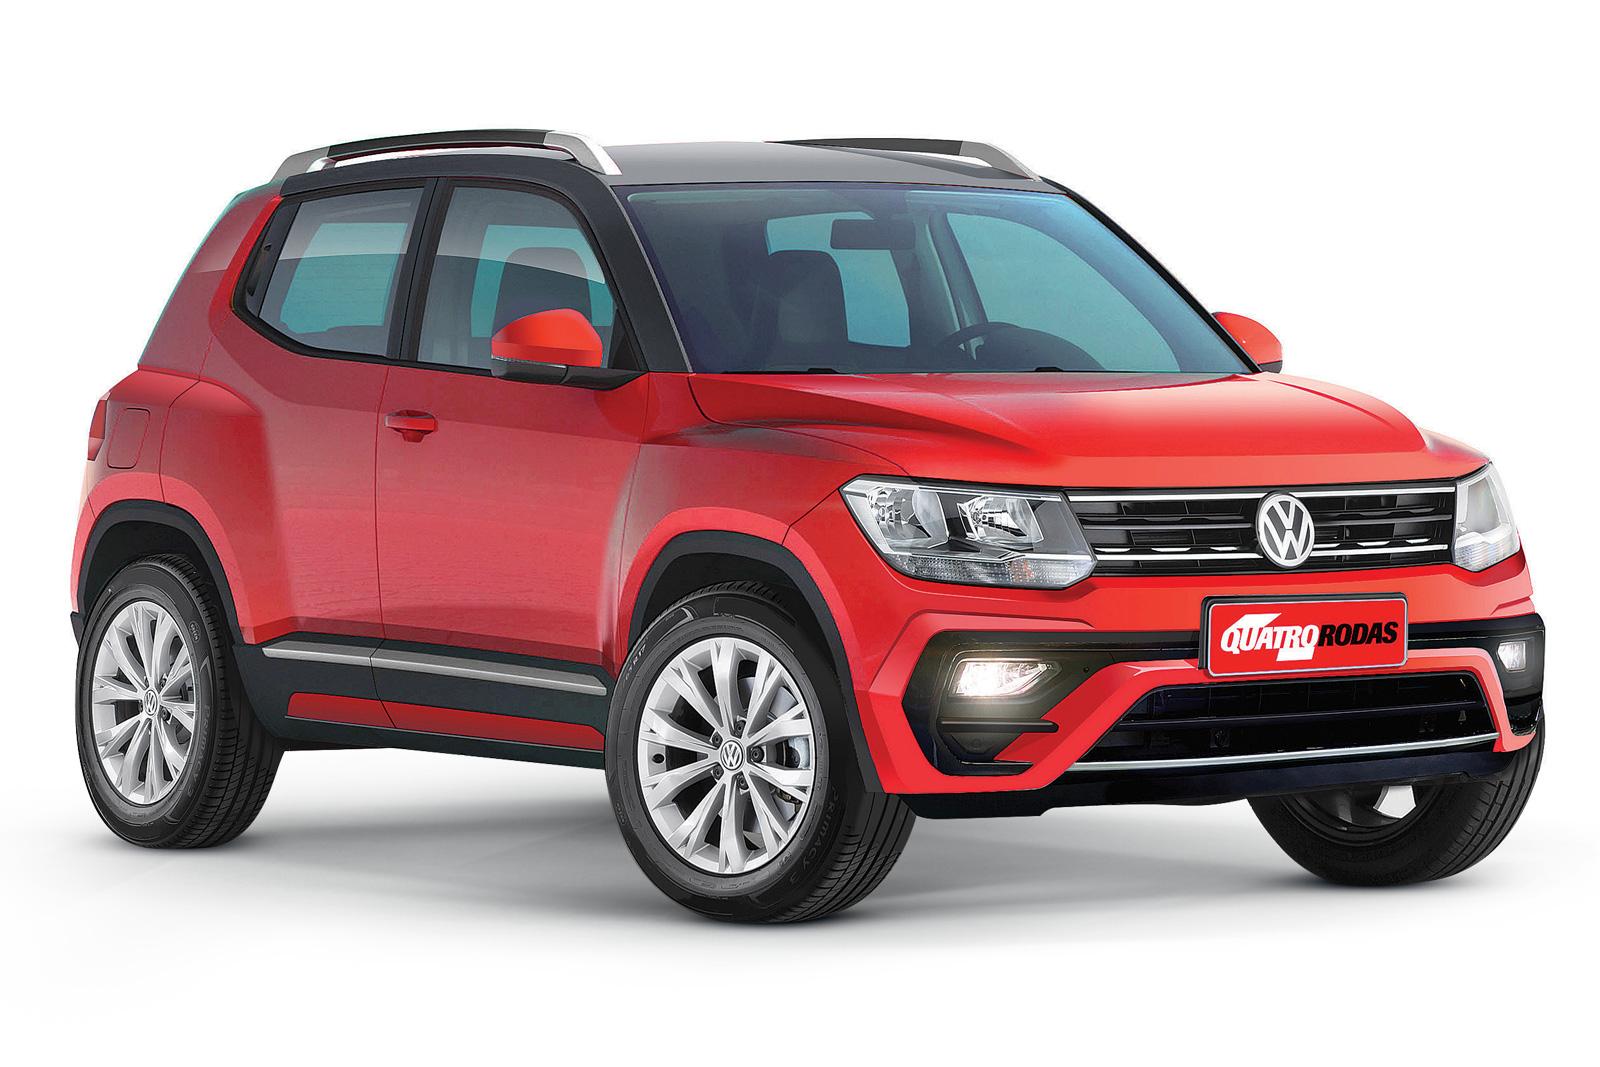 VW CUV A0